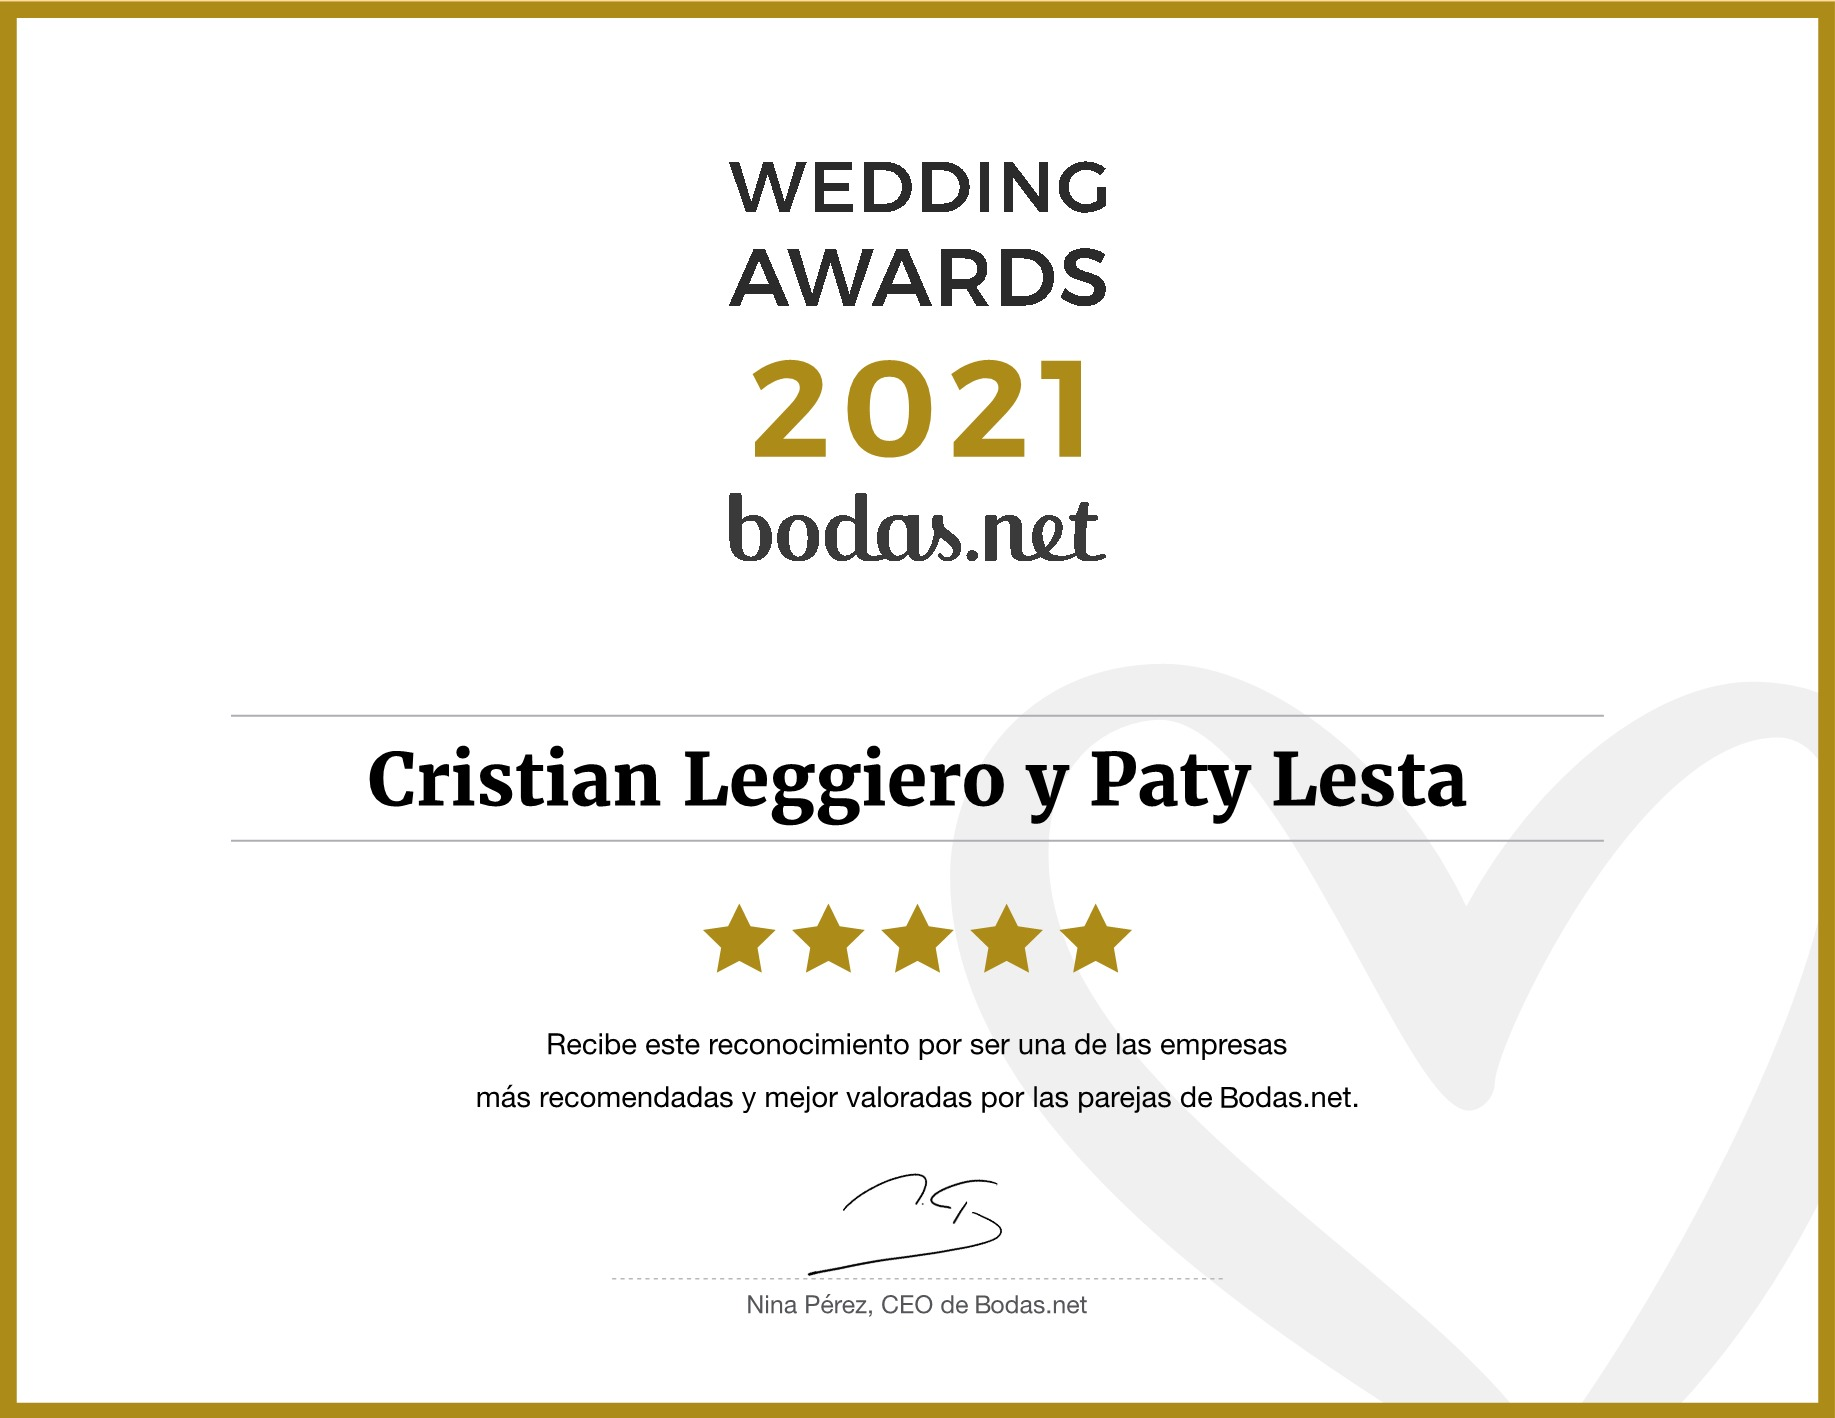 Wedding_Awards_2021 Duo Cristian Leggiero y Paty Lesta